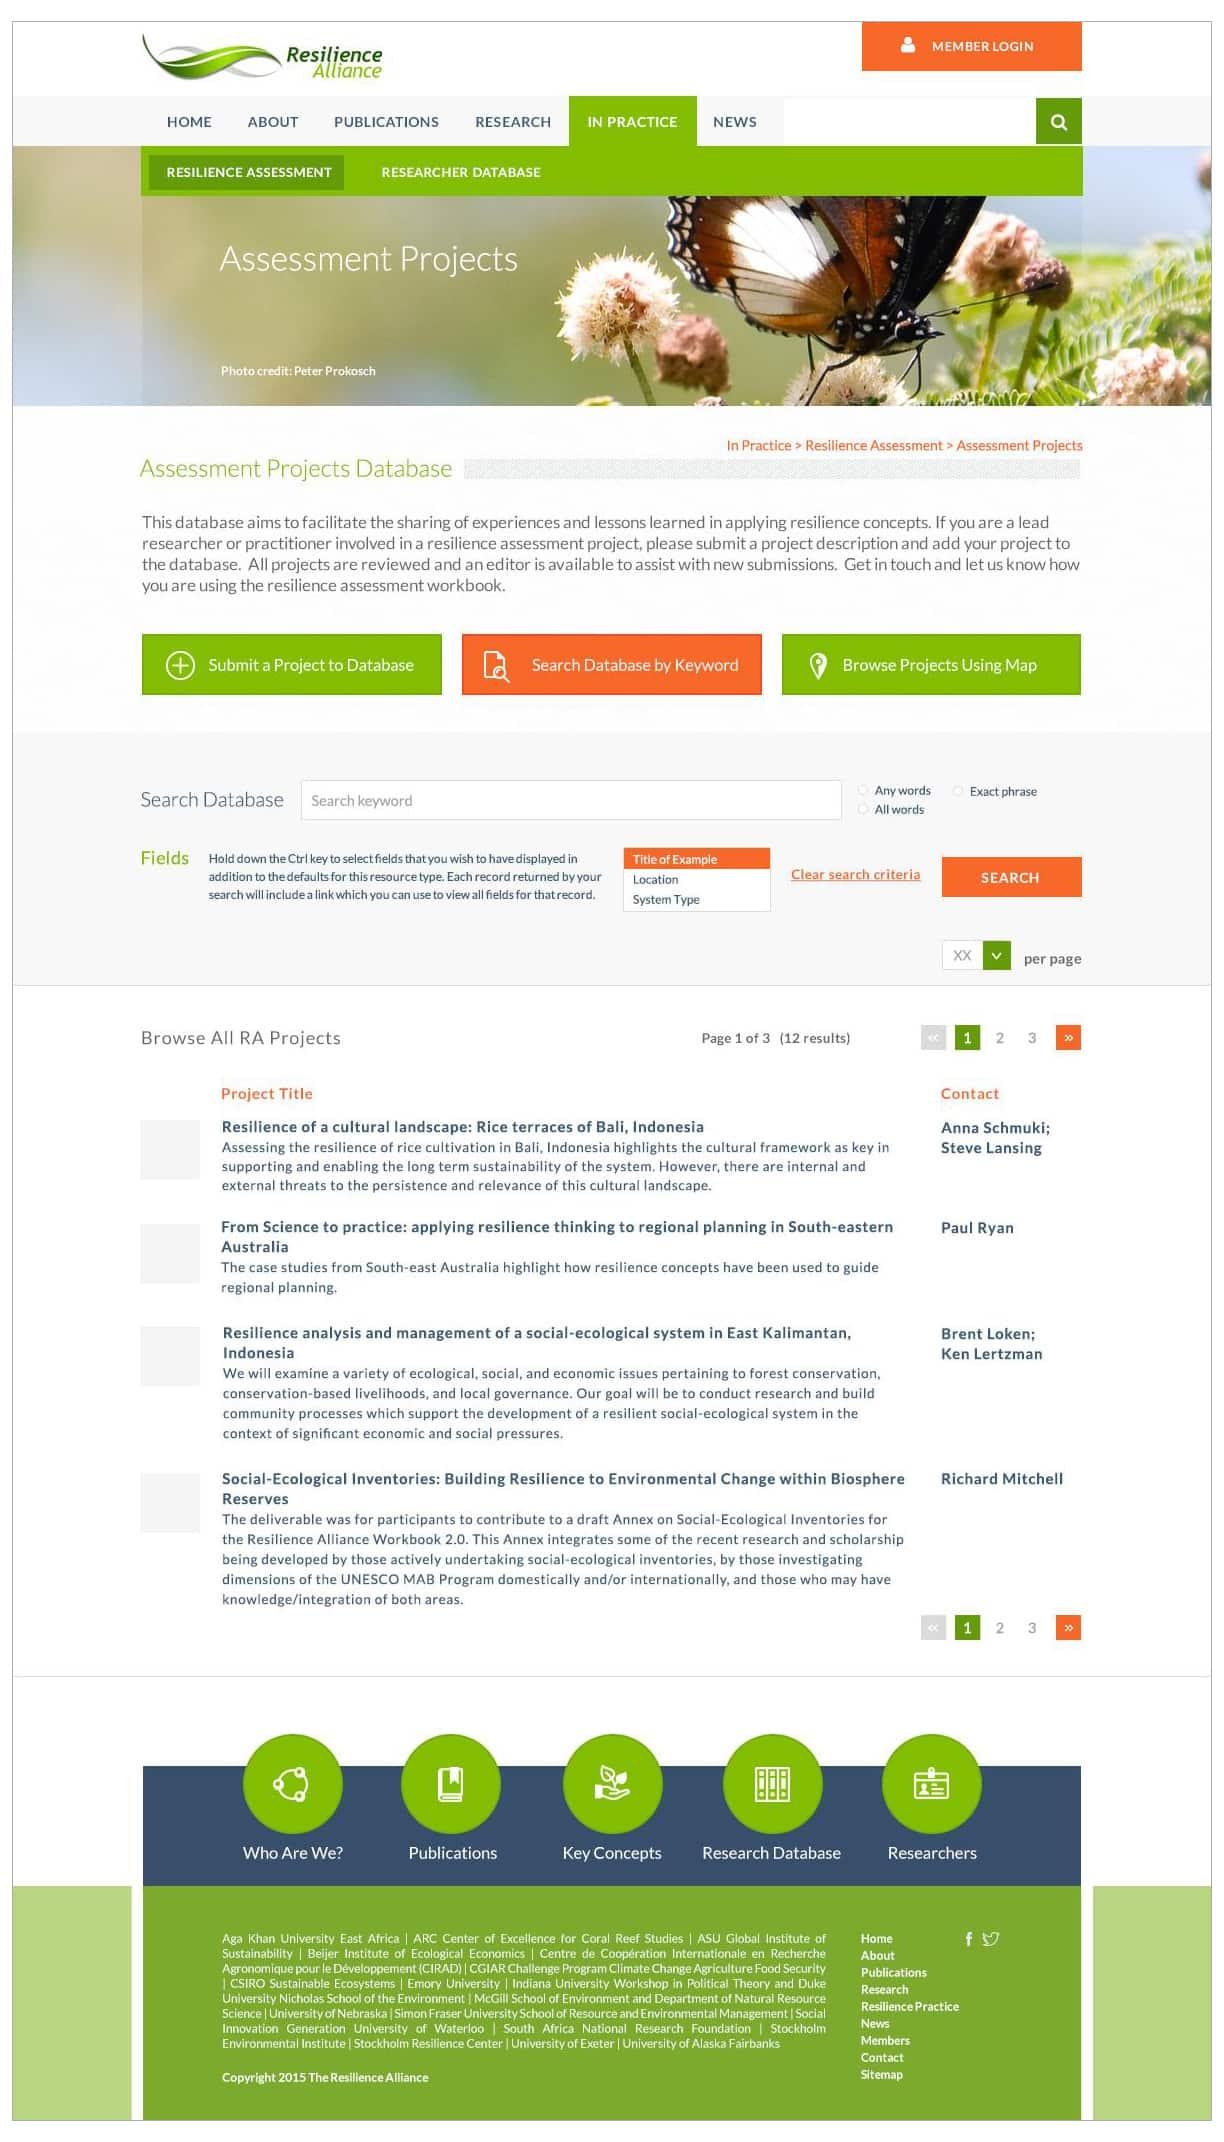 Resilience Alliance website